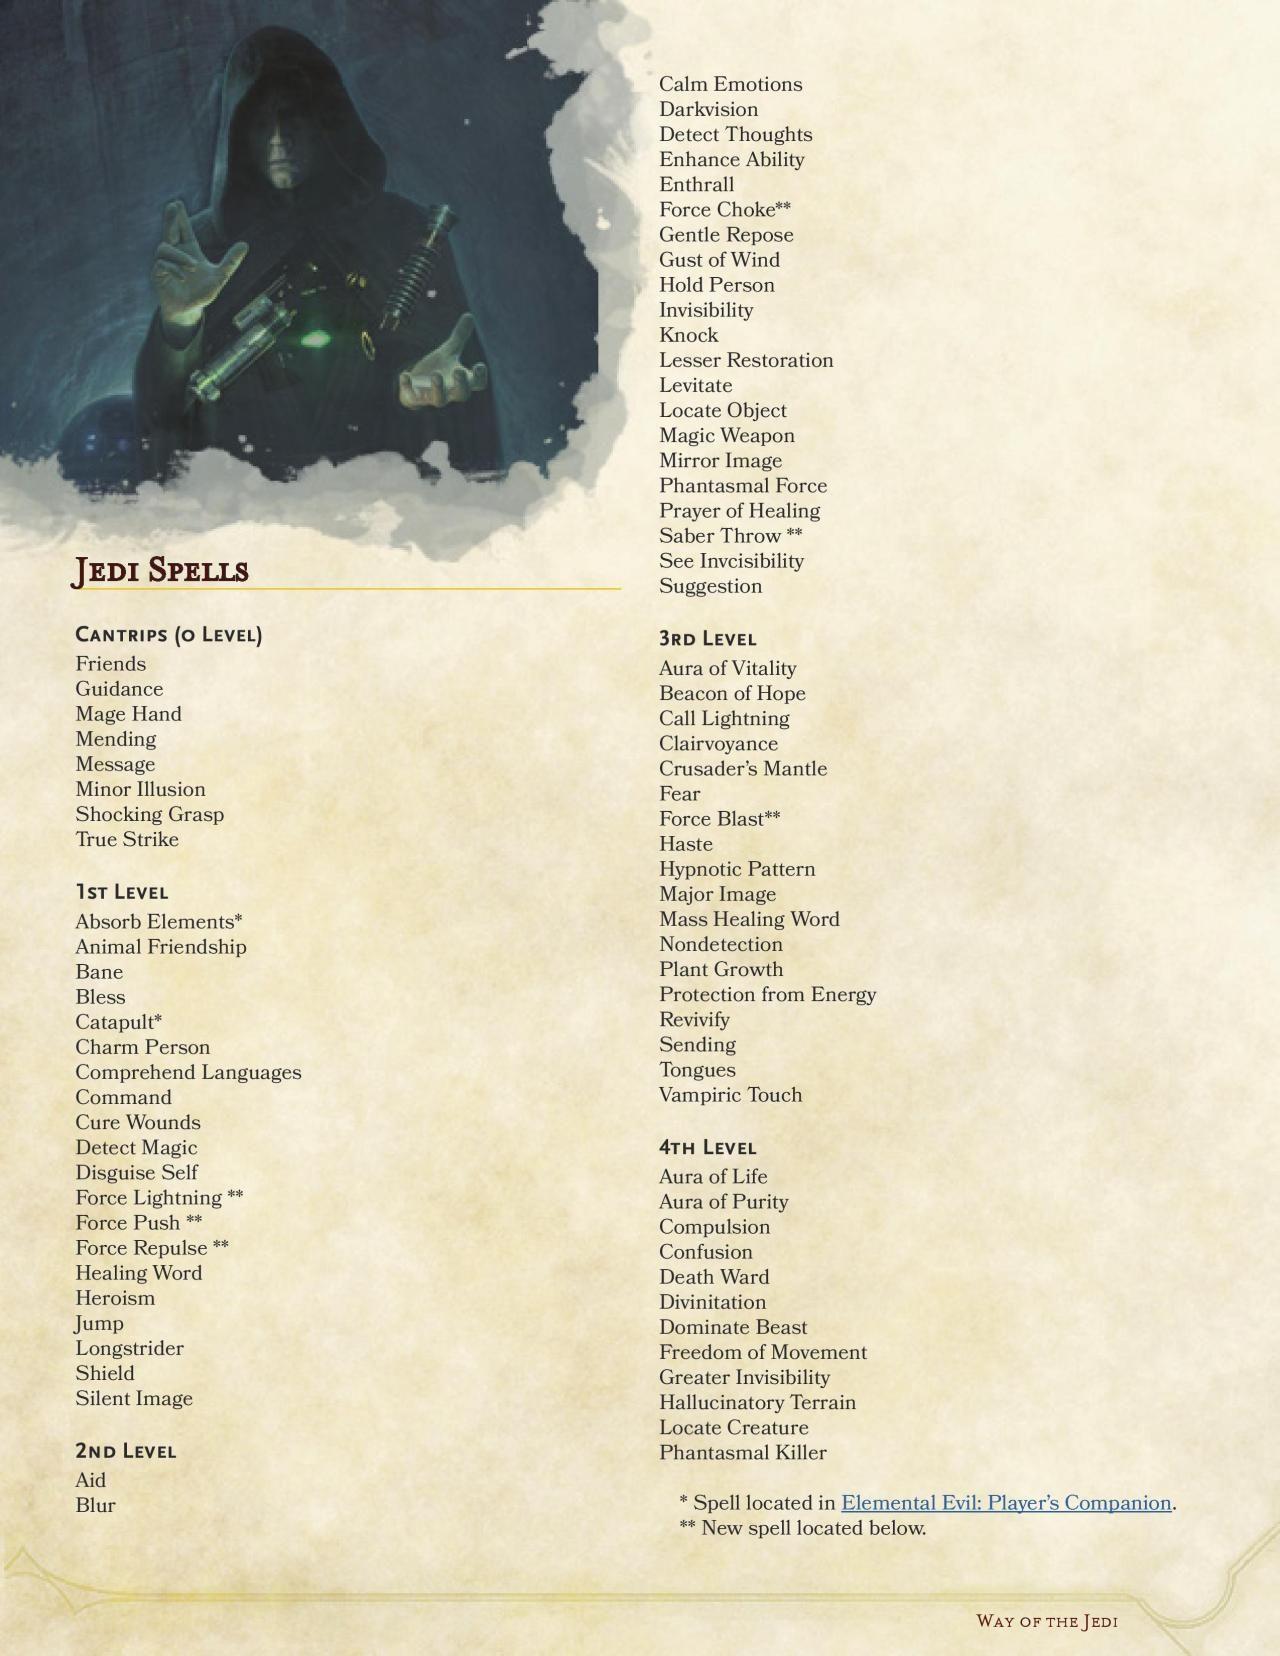 DnD 5e Homebrew — Way of the Jedi Monk by SpiketailDrake